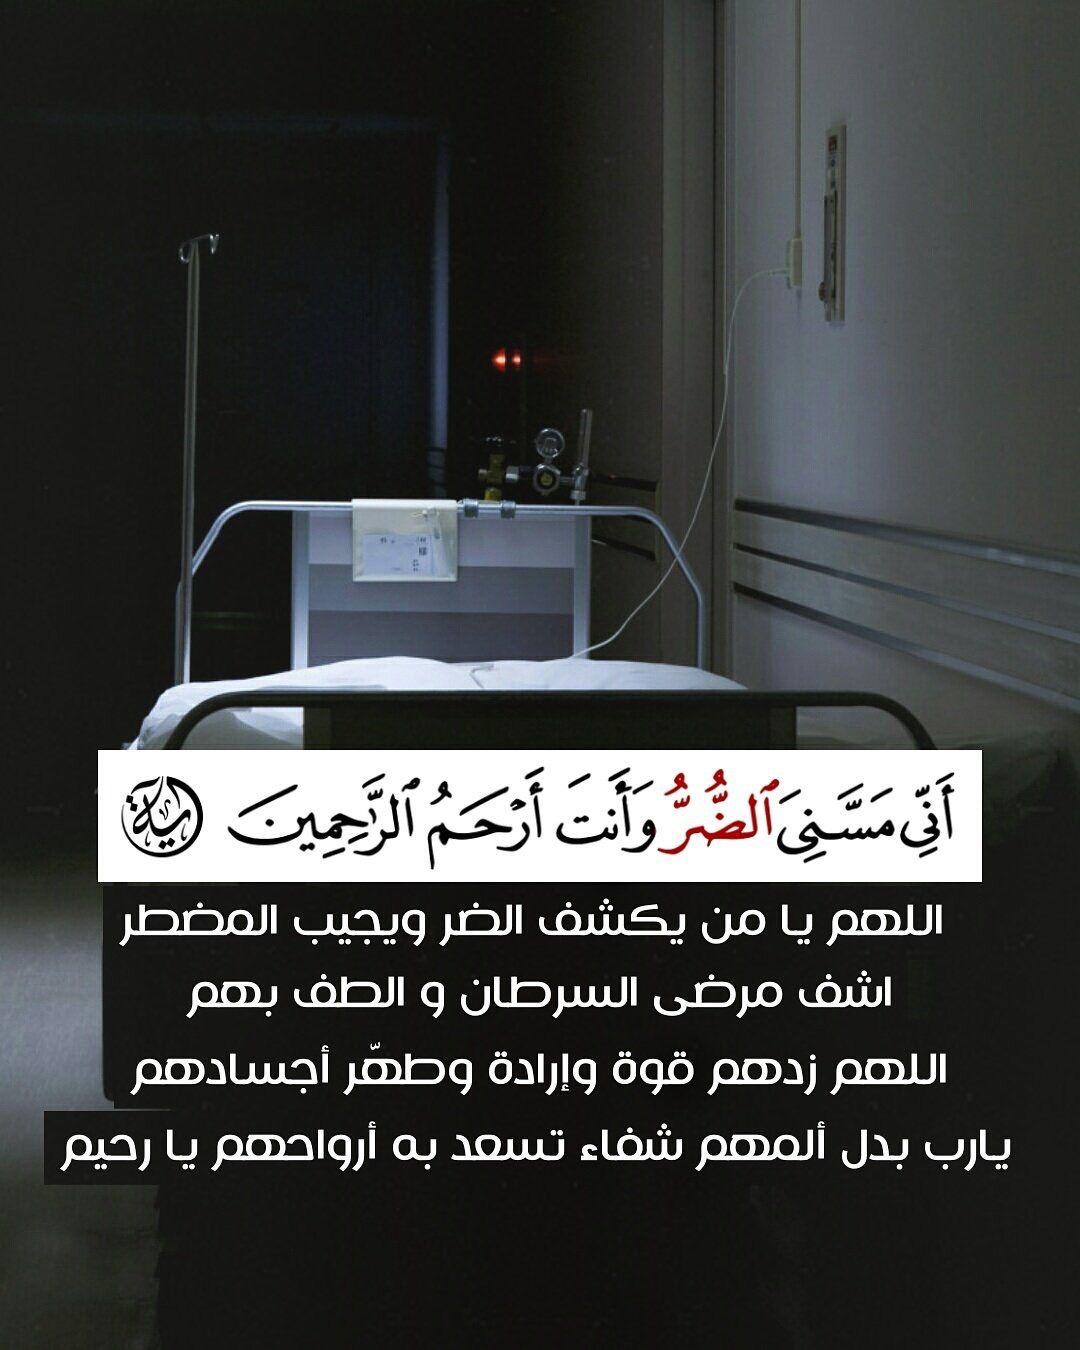 Pin By Ldisee Monarcho On تدبر القرآن Quran Verses Noble Quran Quran